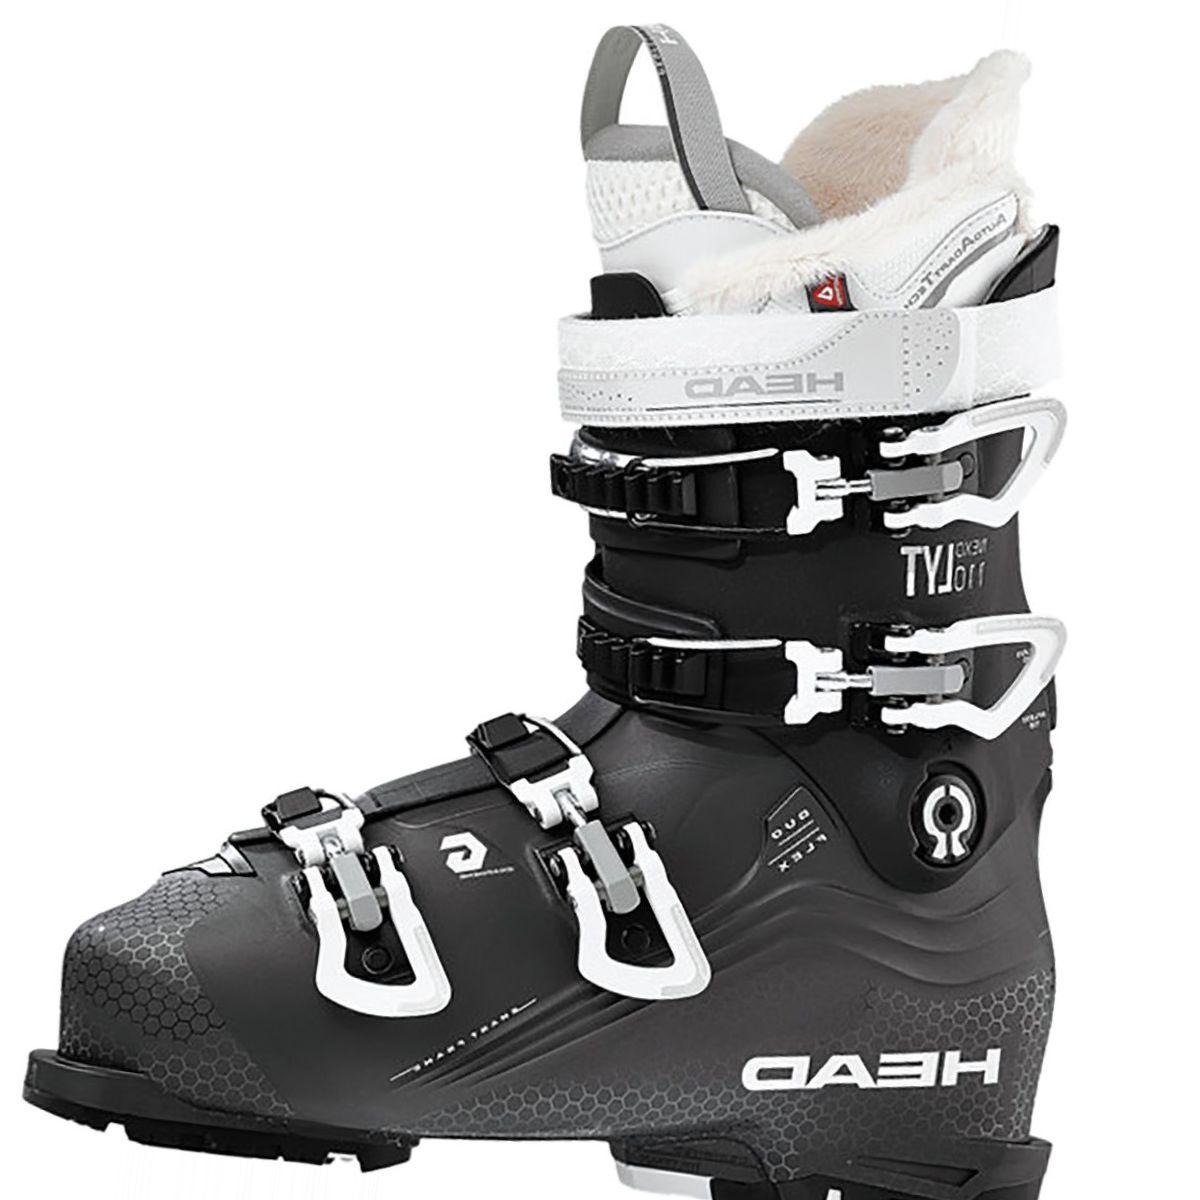 Head Skis USA Nexo LYT 110 Ski Boot - Women's